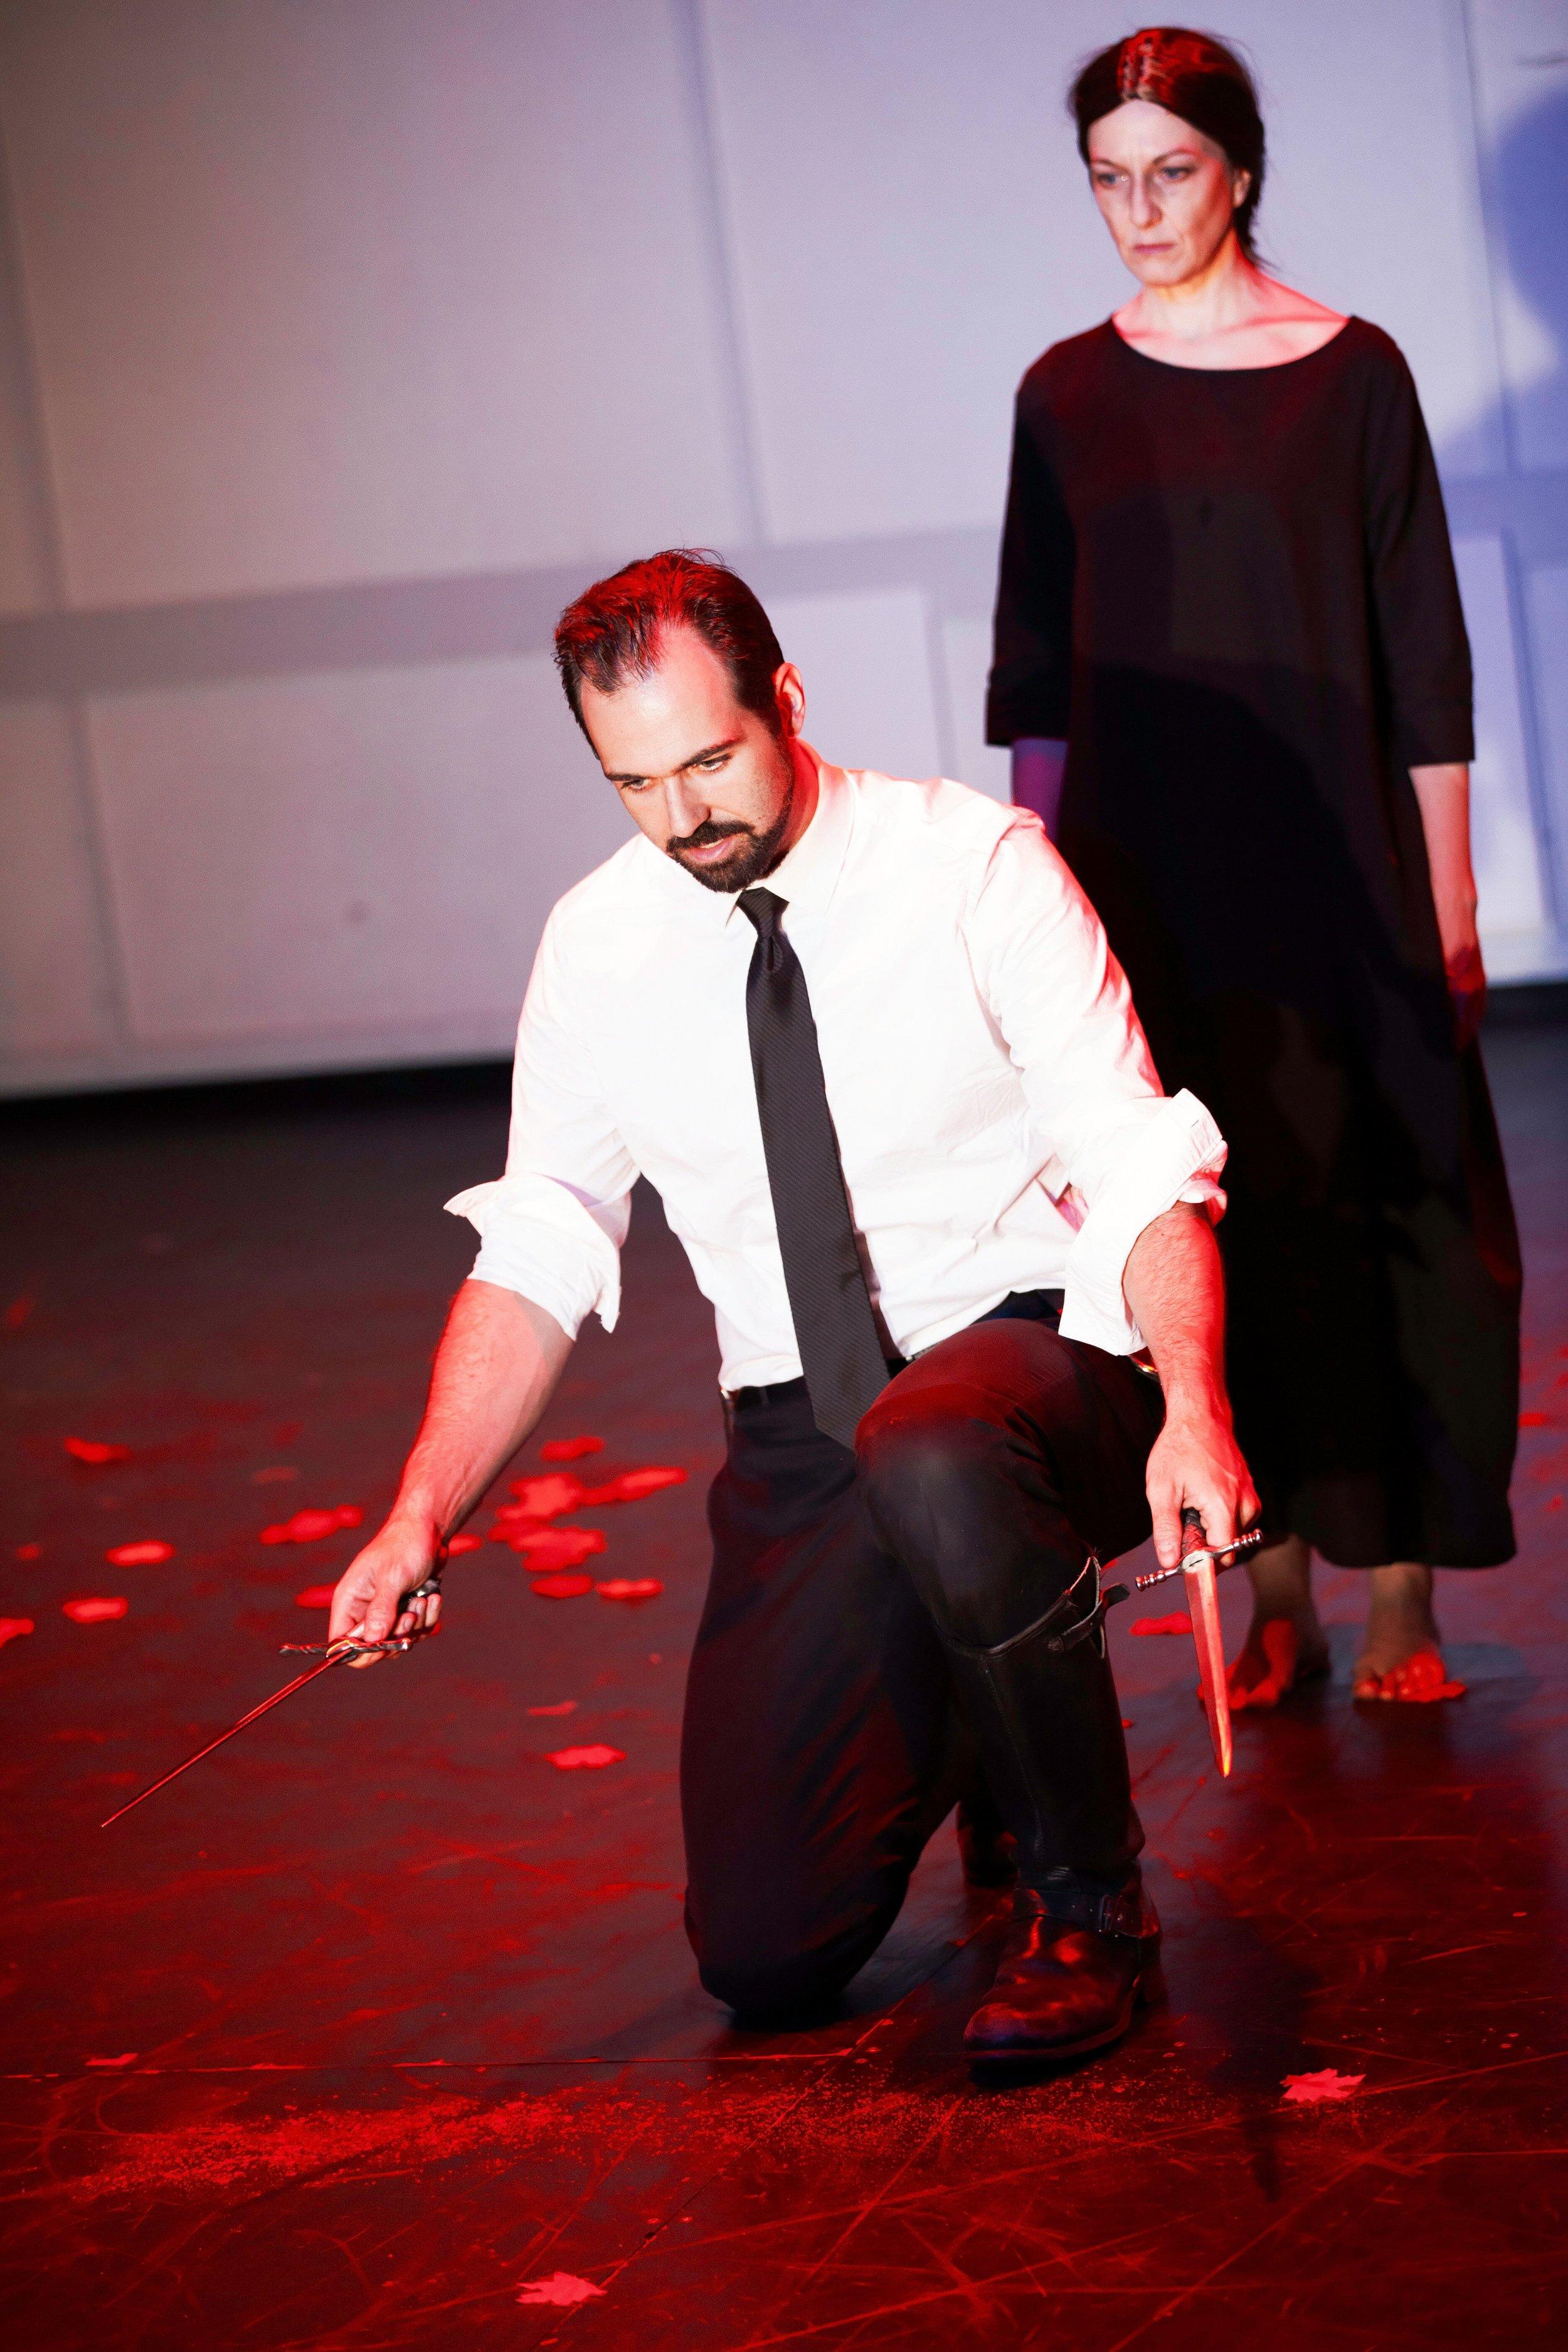 Macbeth - STC's ACA